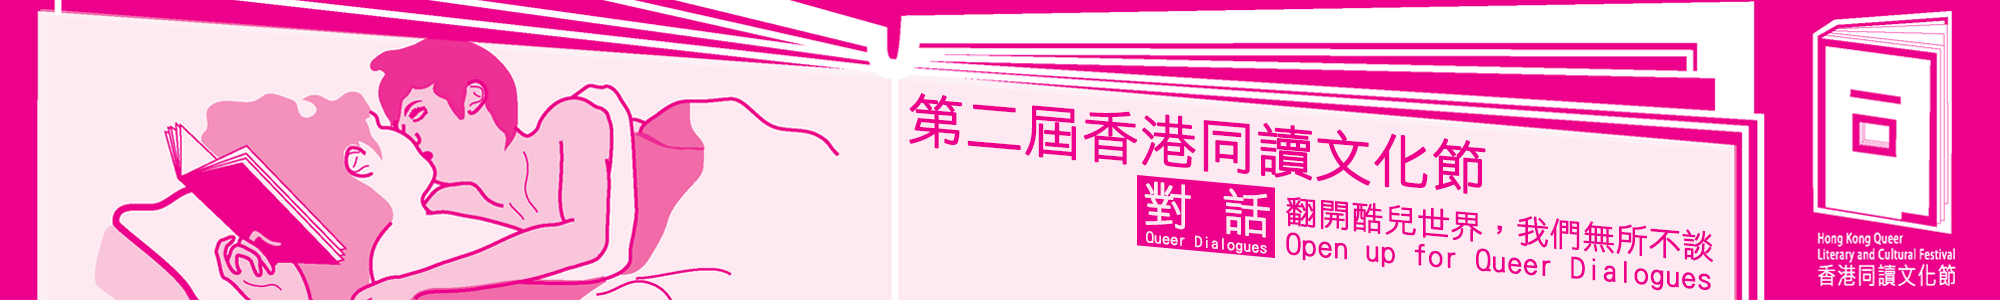 banner_hkqlcf